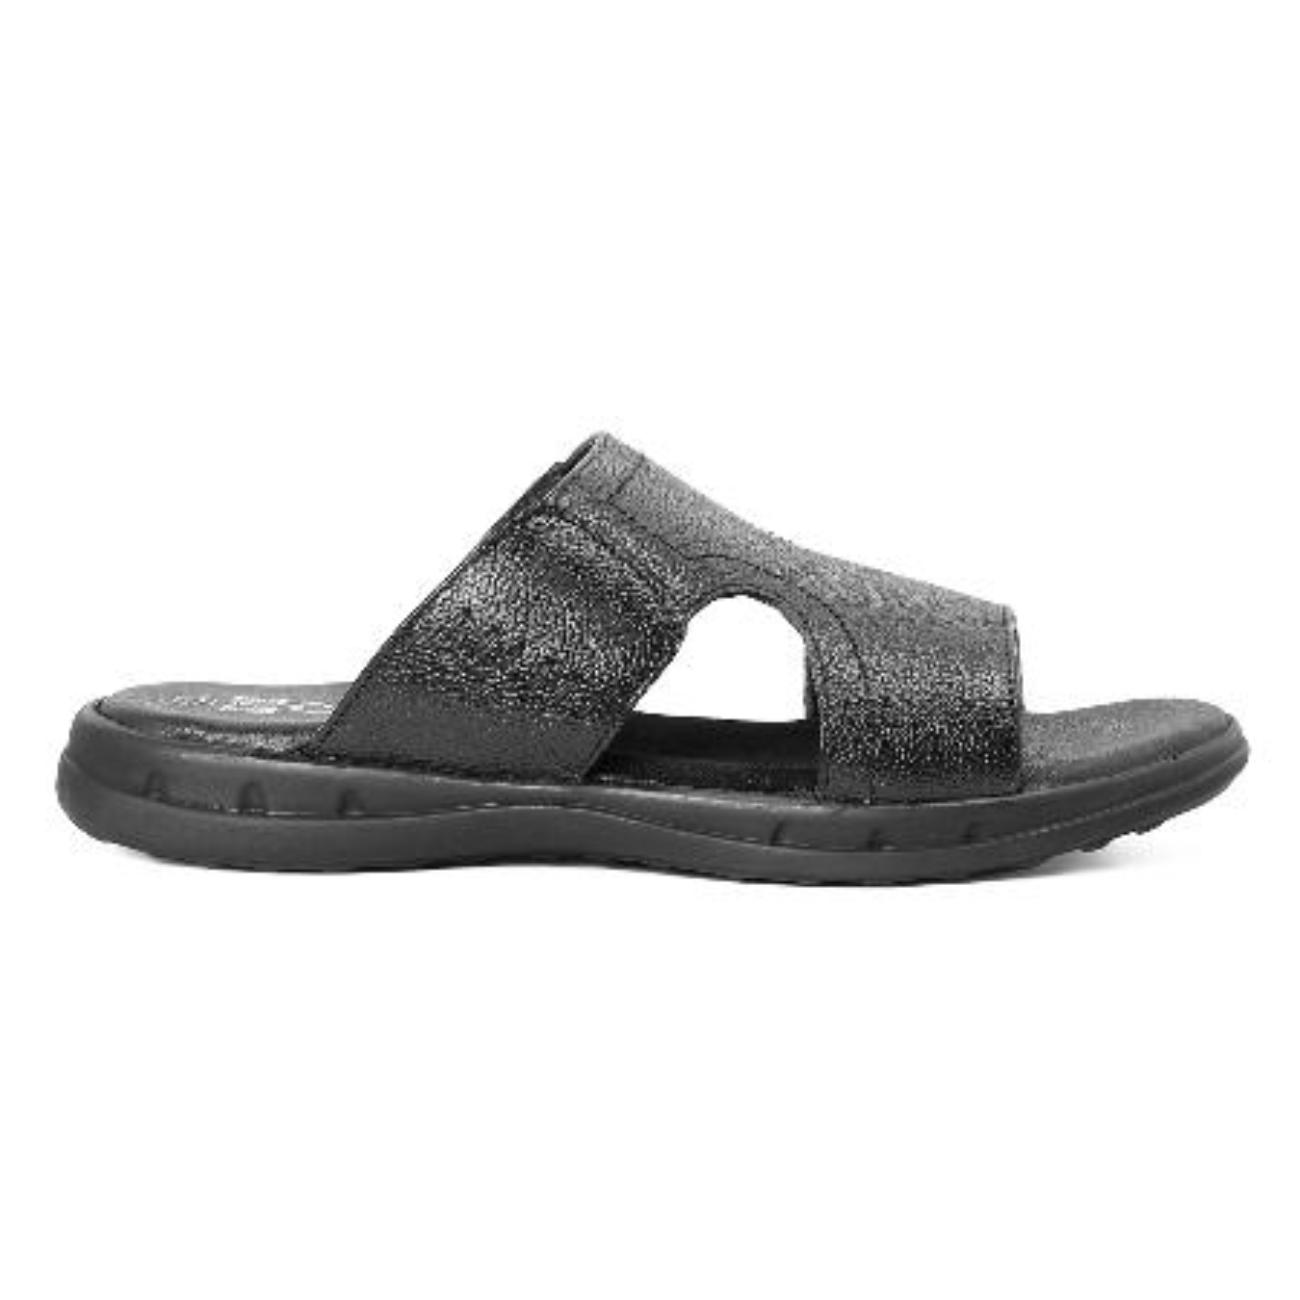 buy black slip-on sandals side view_1